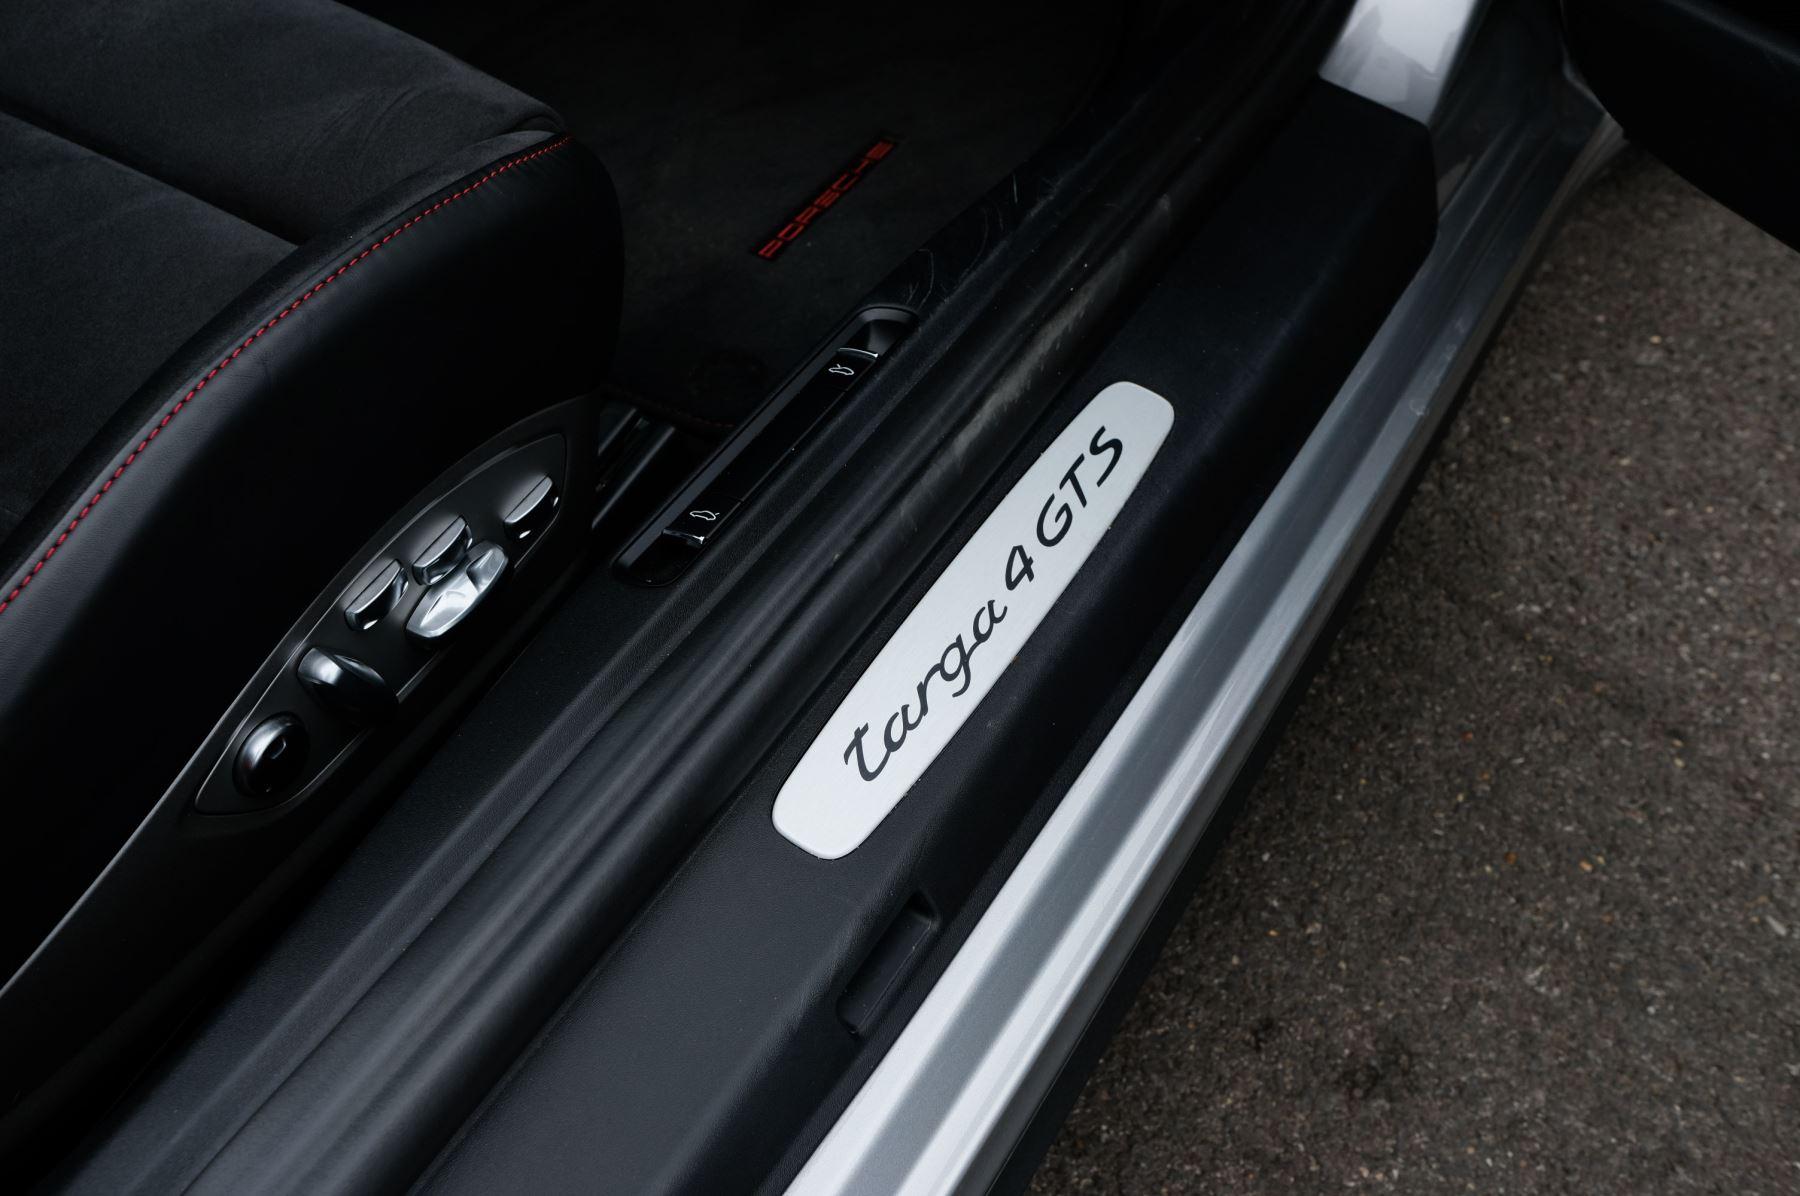 Porsche 911 TARGA 4 GTS - PDK - SPORT DESIGN PACKAGE - GTS INTERIOR PACKAGE image 17